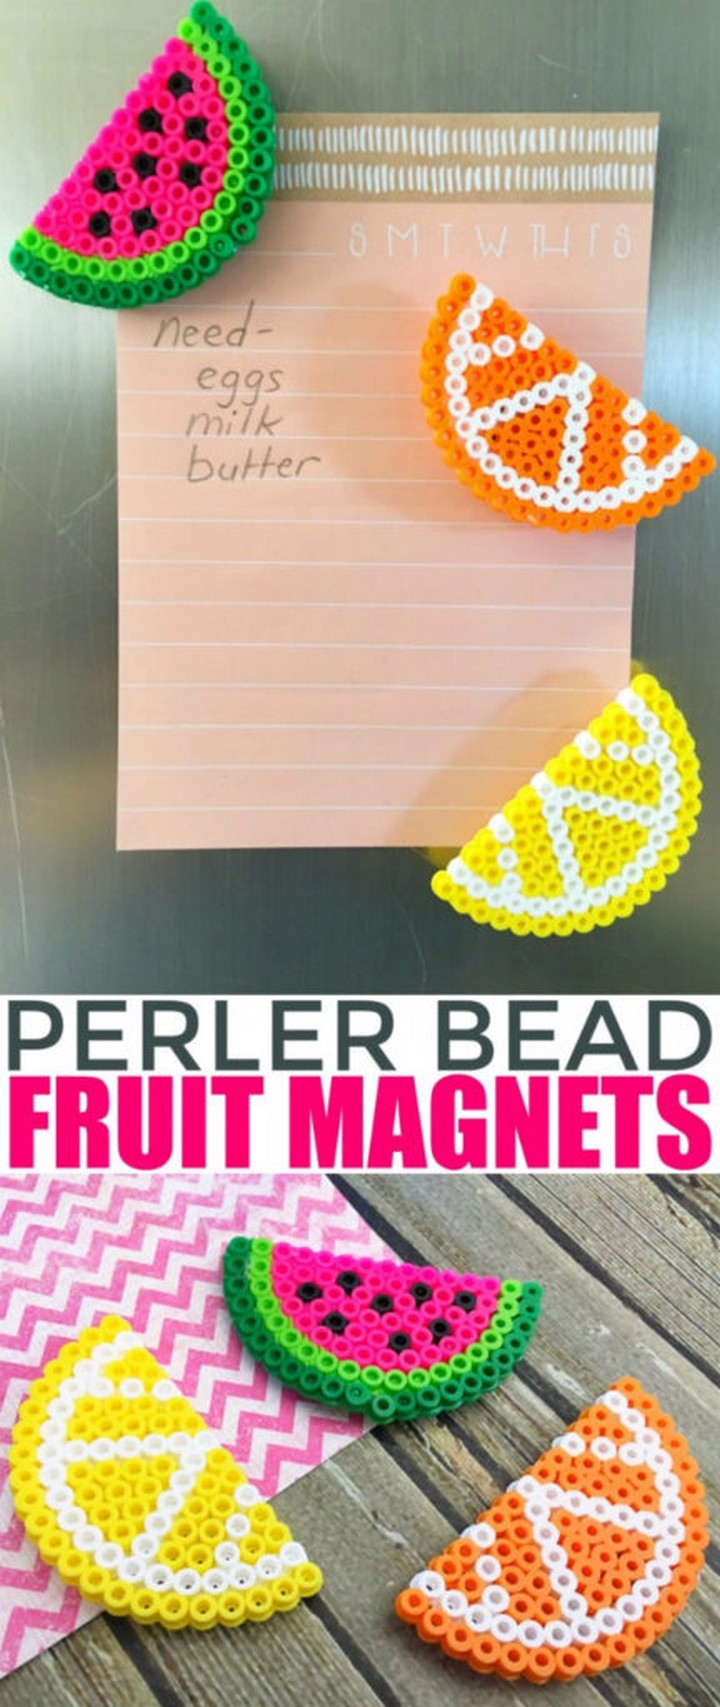 Perler Bead Fruit Magnets DIY